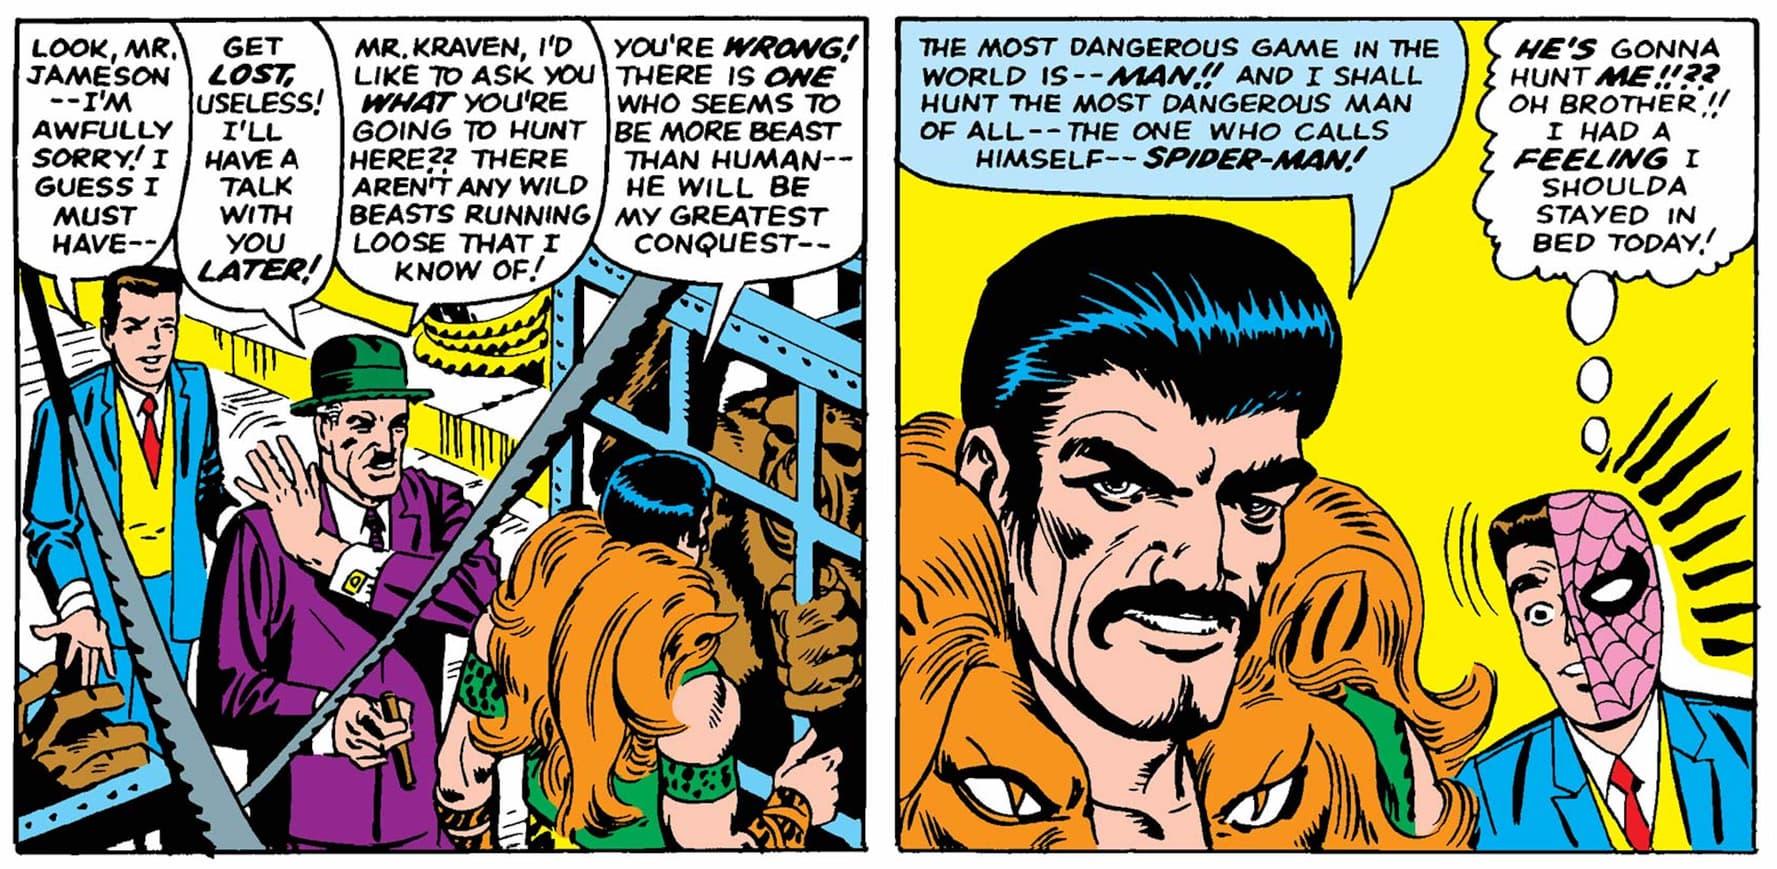 THE AMAZING SPIDER-MAN (1963) #15